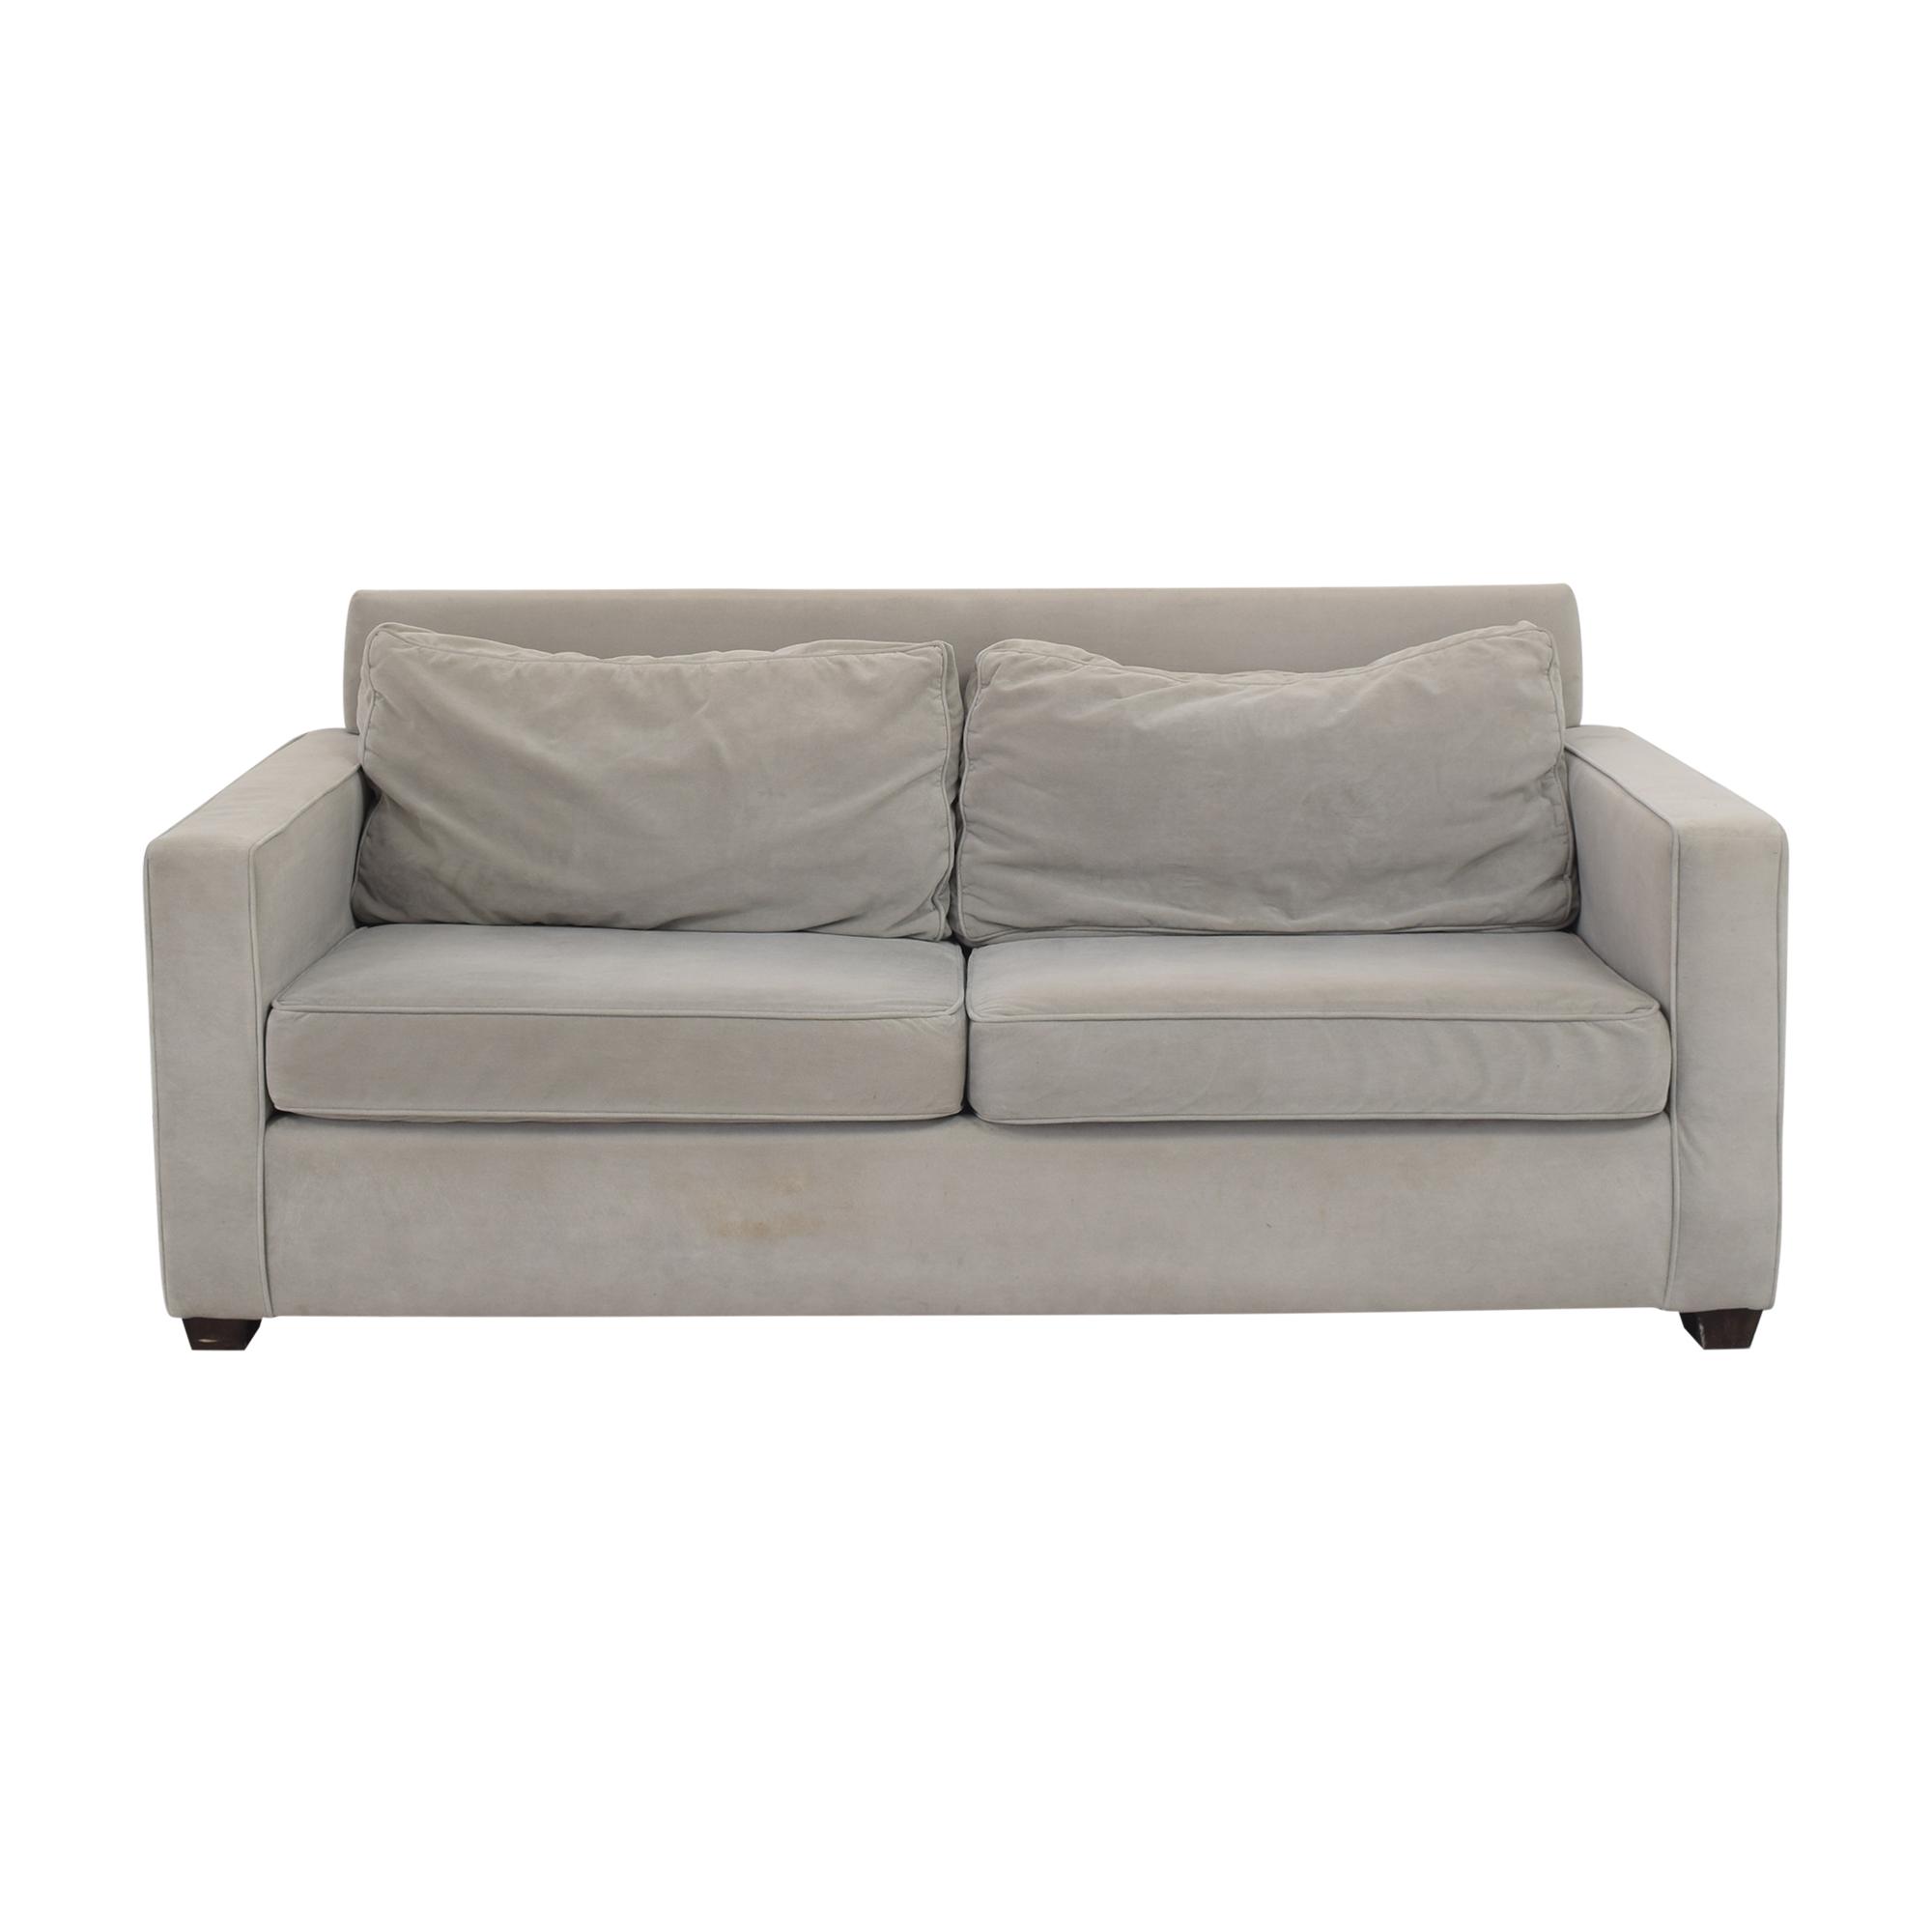 West Elm West Elm Henry Two Cushion Sofa